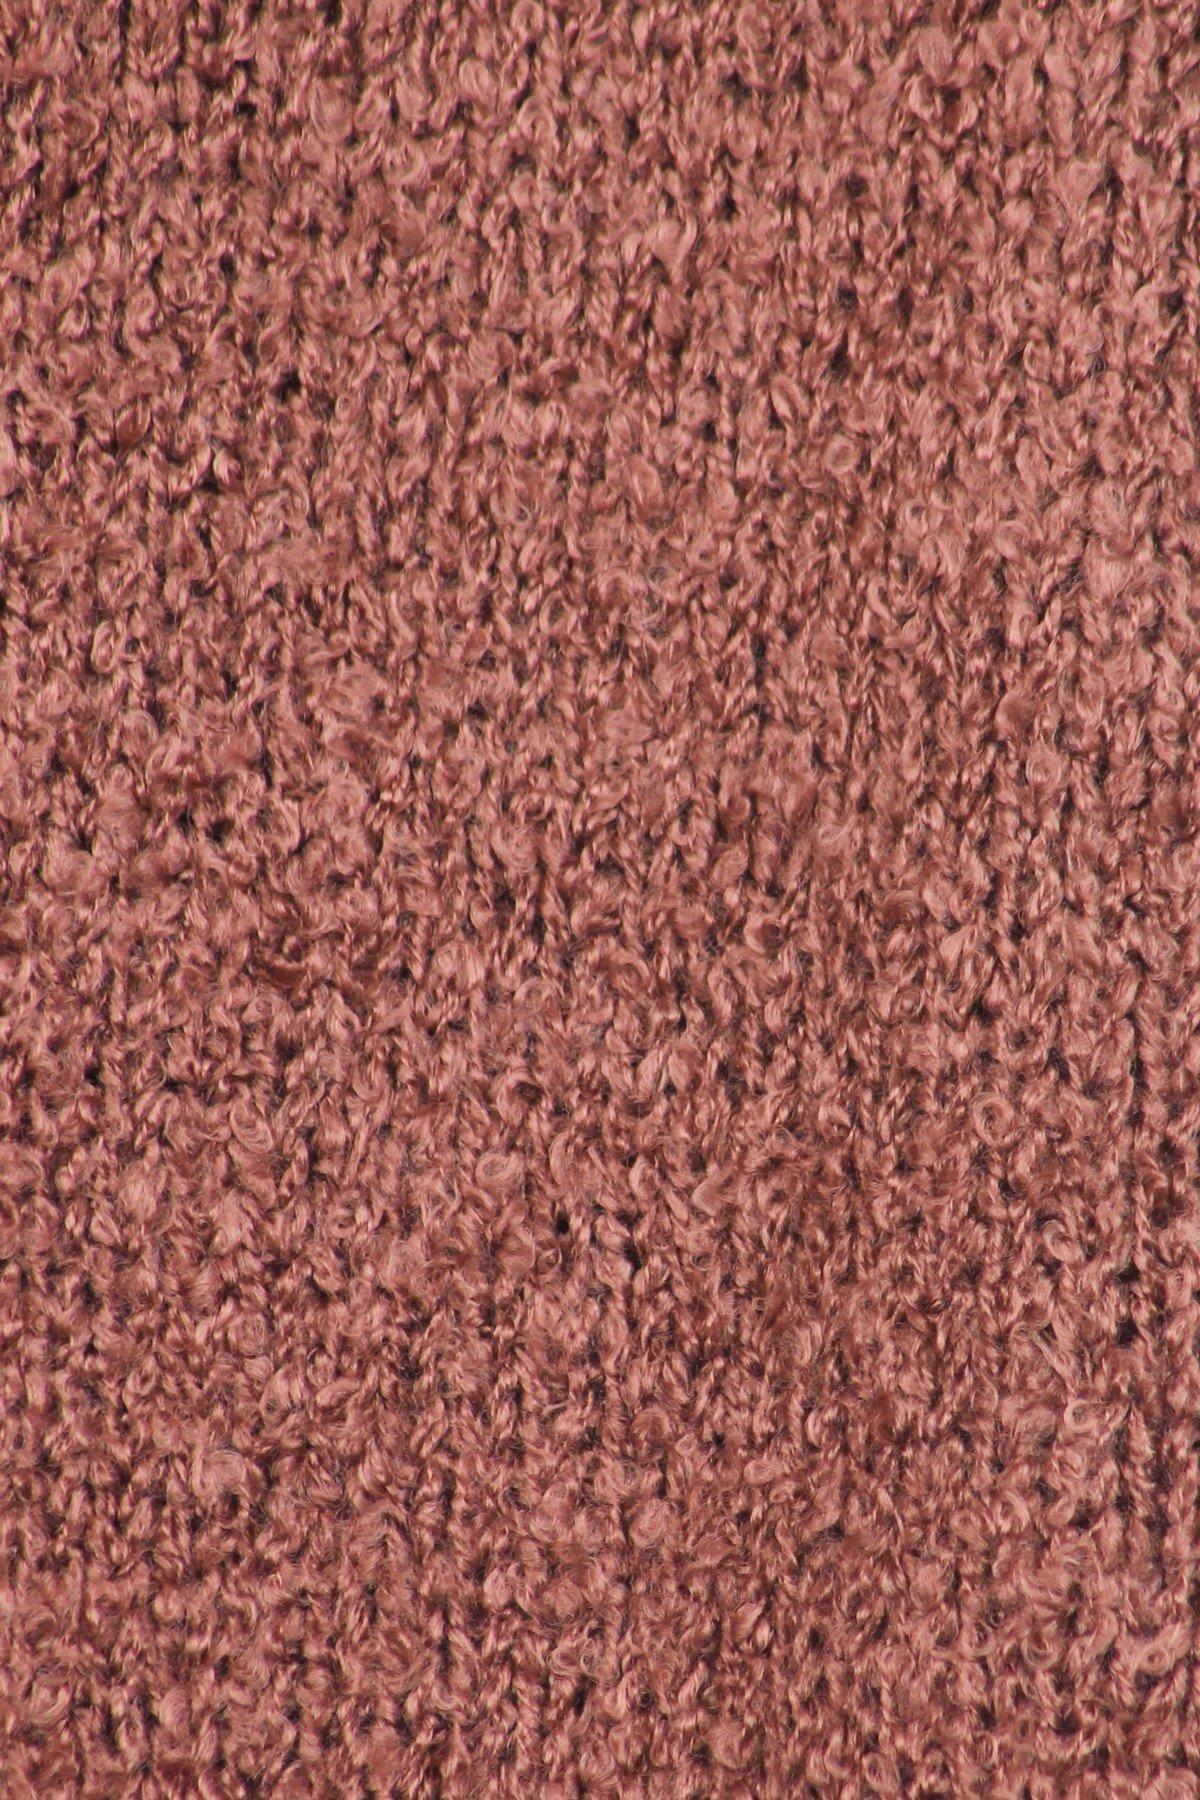 ICONOFLASH Women's Casual Sweater Knit Fringed Fashion Scarf Wrap, Mauve by ICONOFLASH (Image #5)